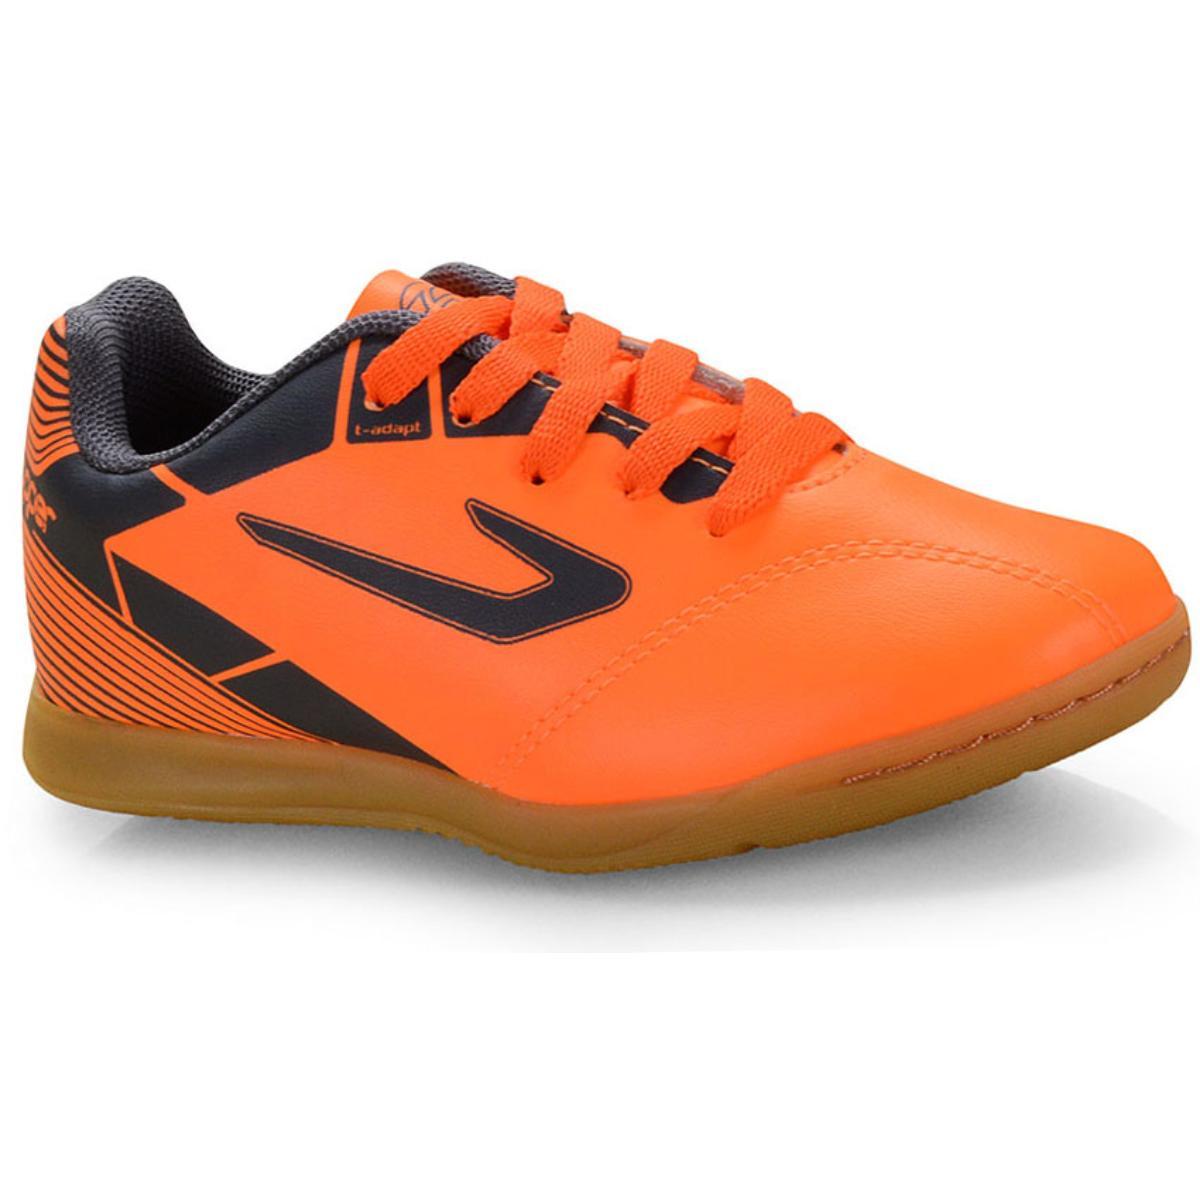 Tênis Masc Infantil Topper 42035404268 Cup ii Inf Futsal Laranja/cinza